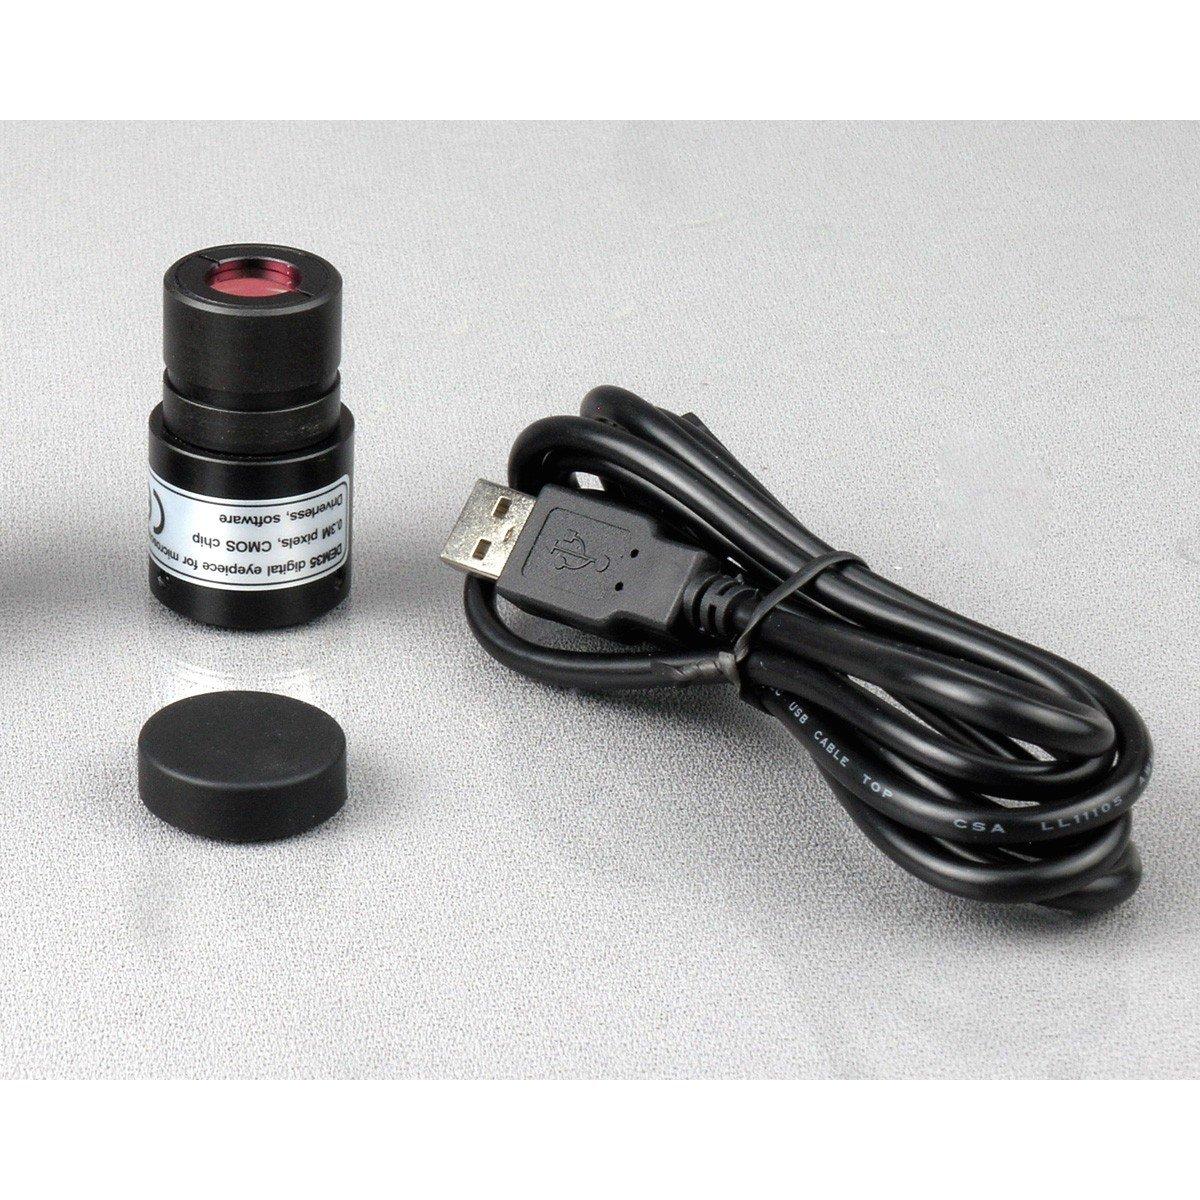 Book+Camera 40X-1000X Cordless Student Biological Microscope+Prepared /& Blank Slides